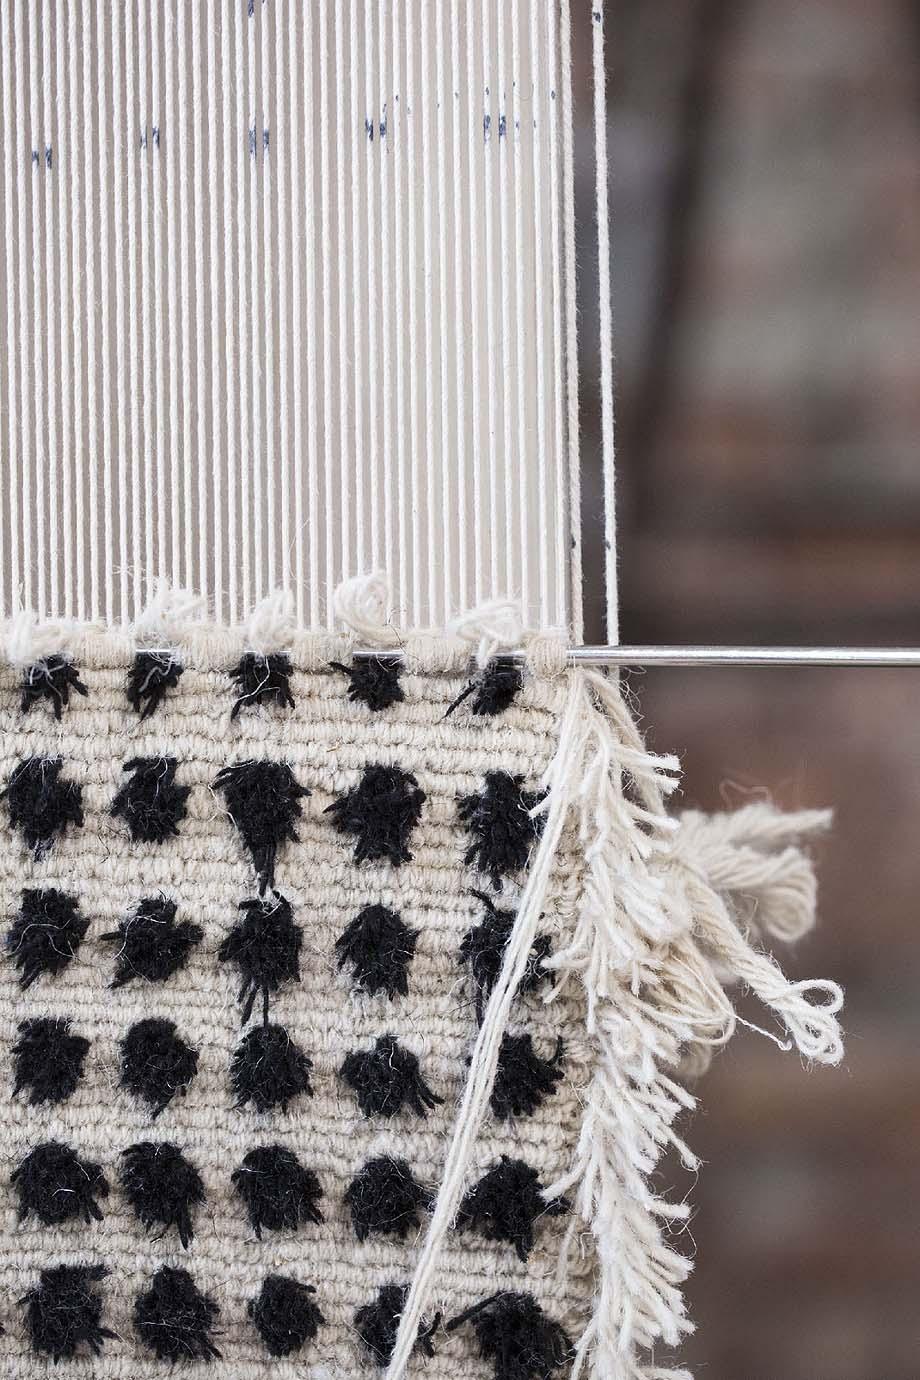 alfombras semis de studio bouroullec para danskina (12)